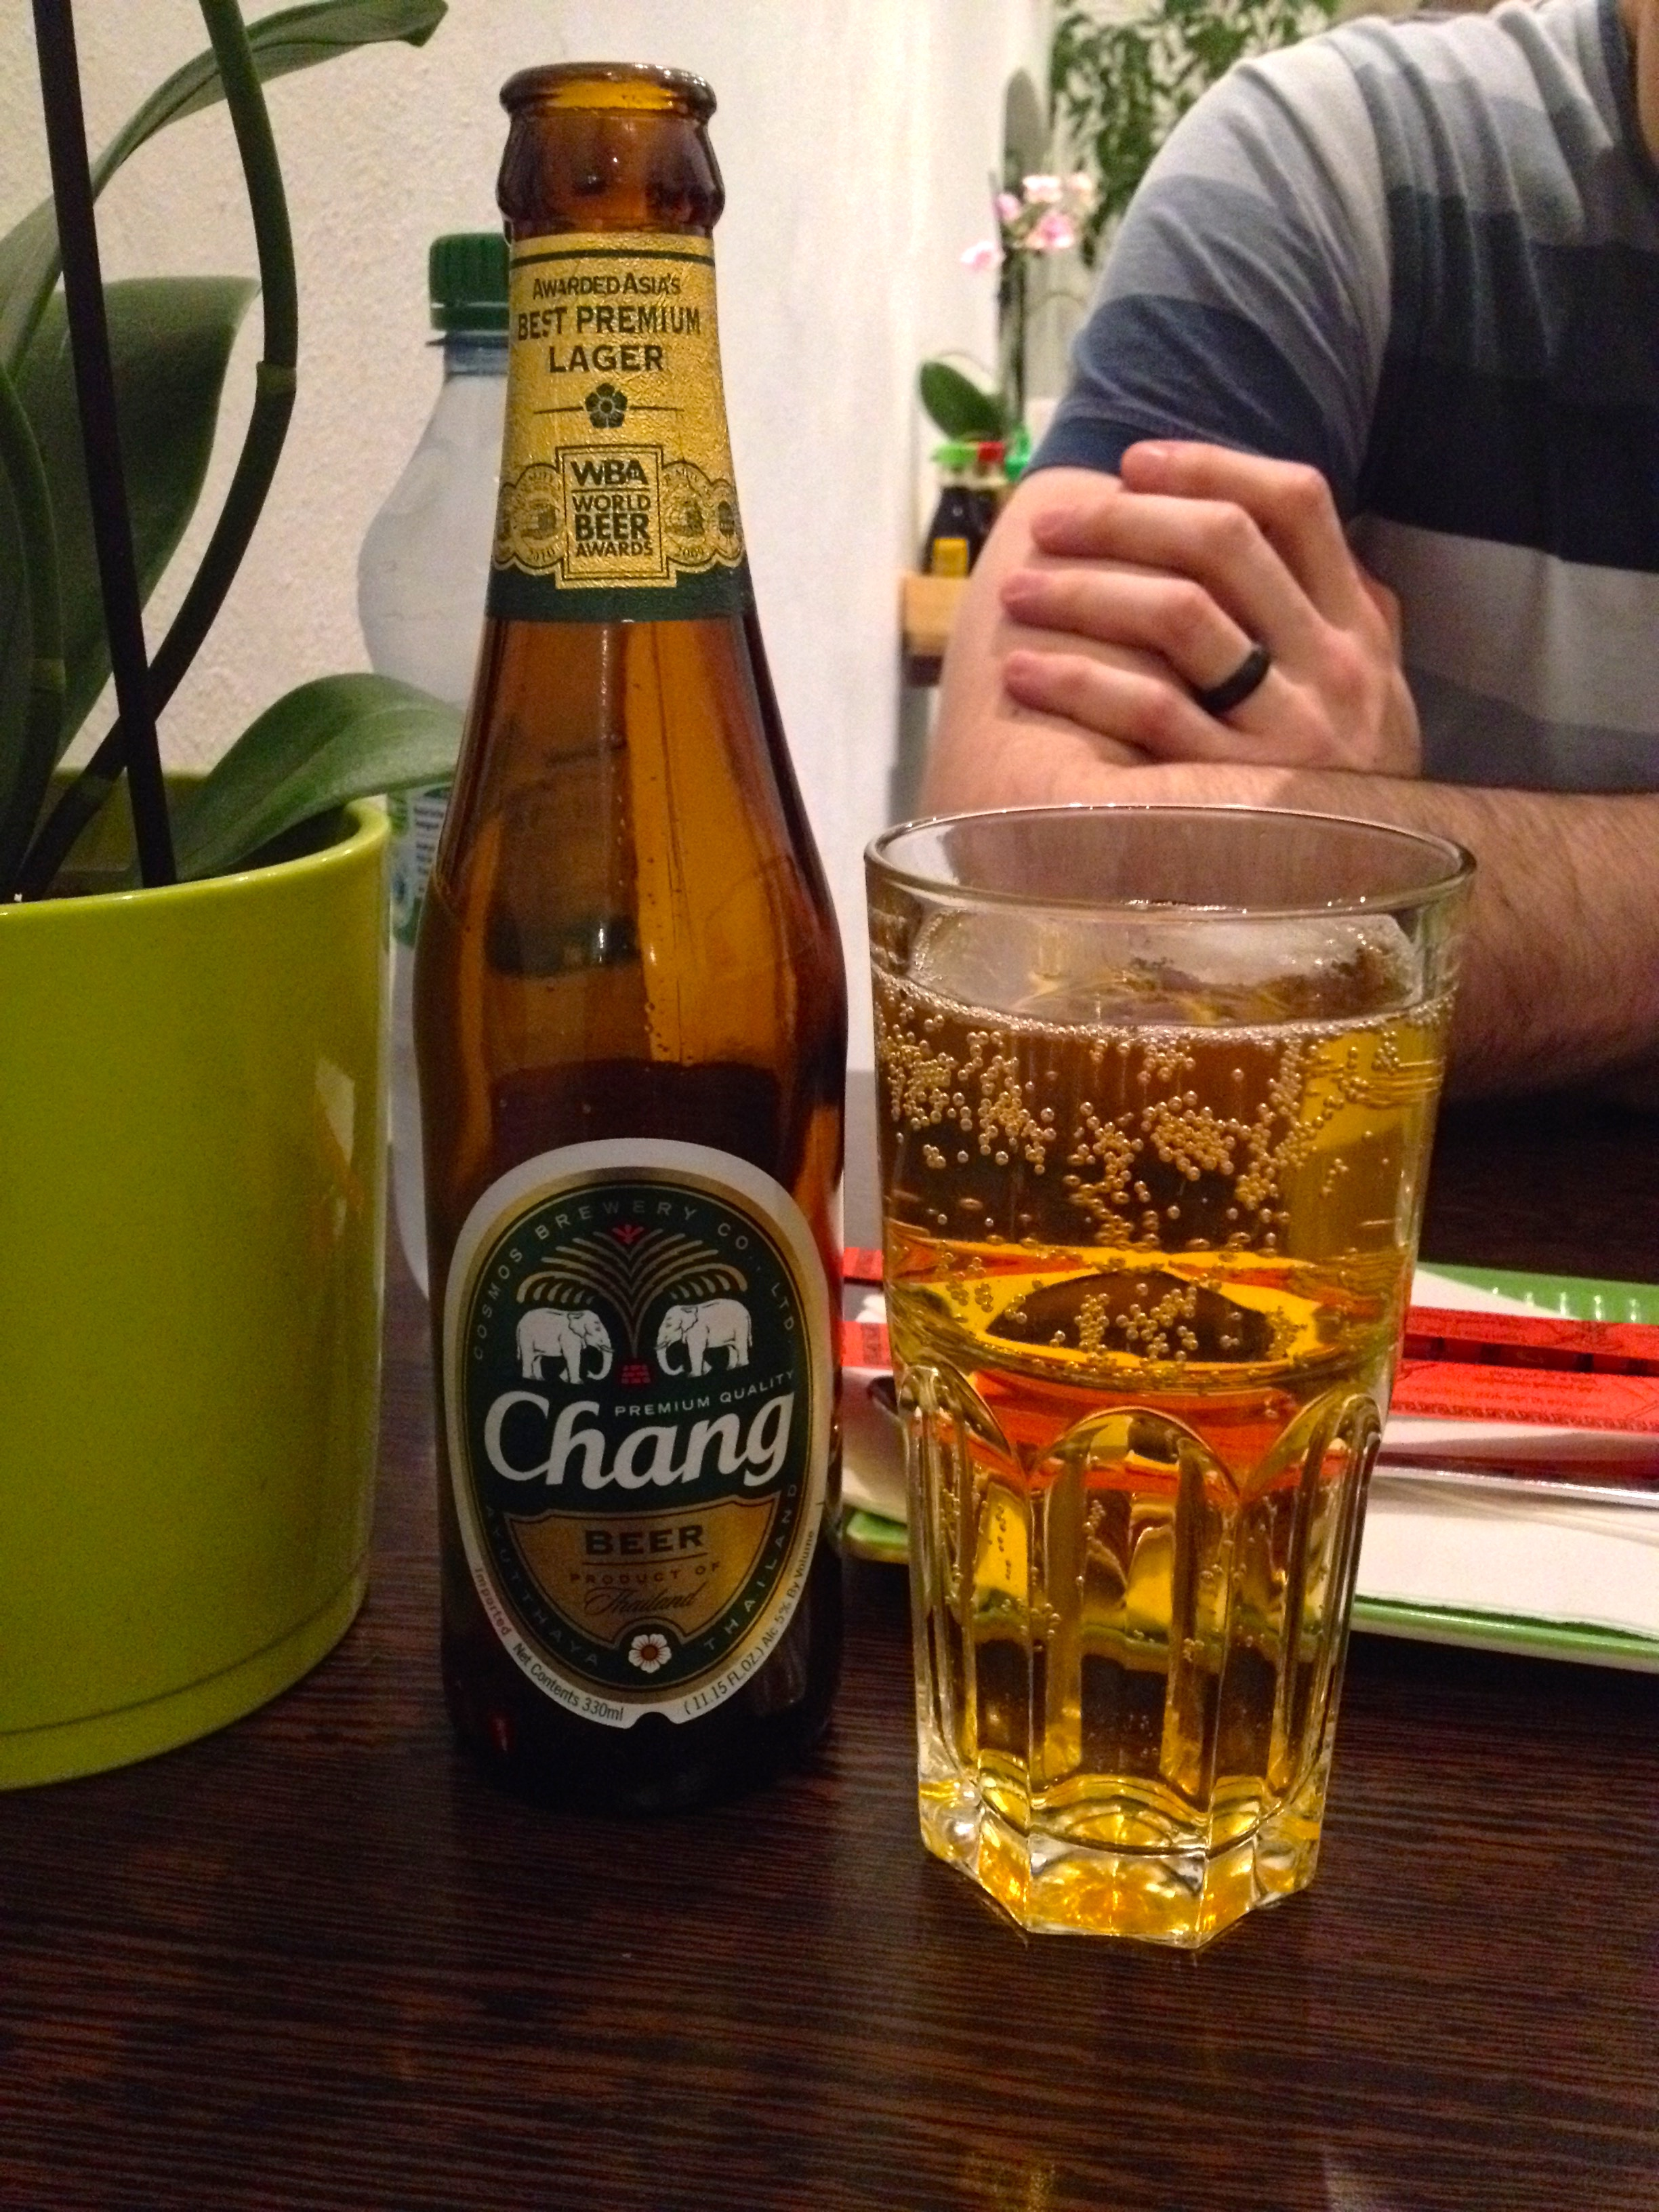 My Thai beer -- crisp and refreshing!